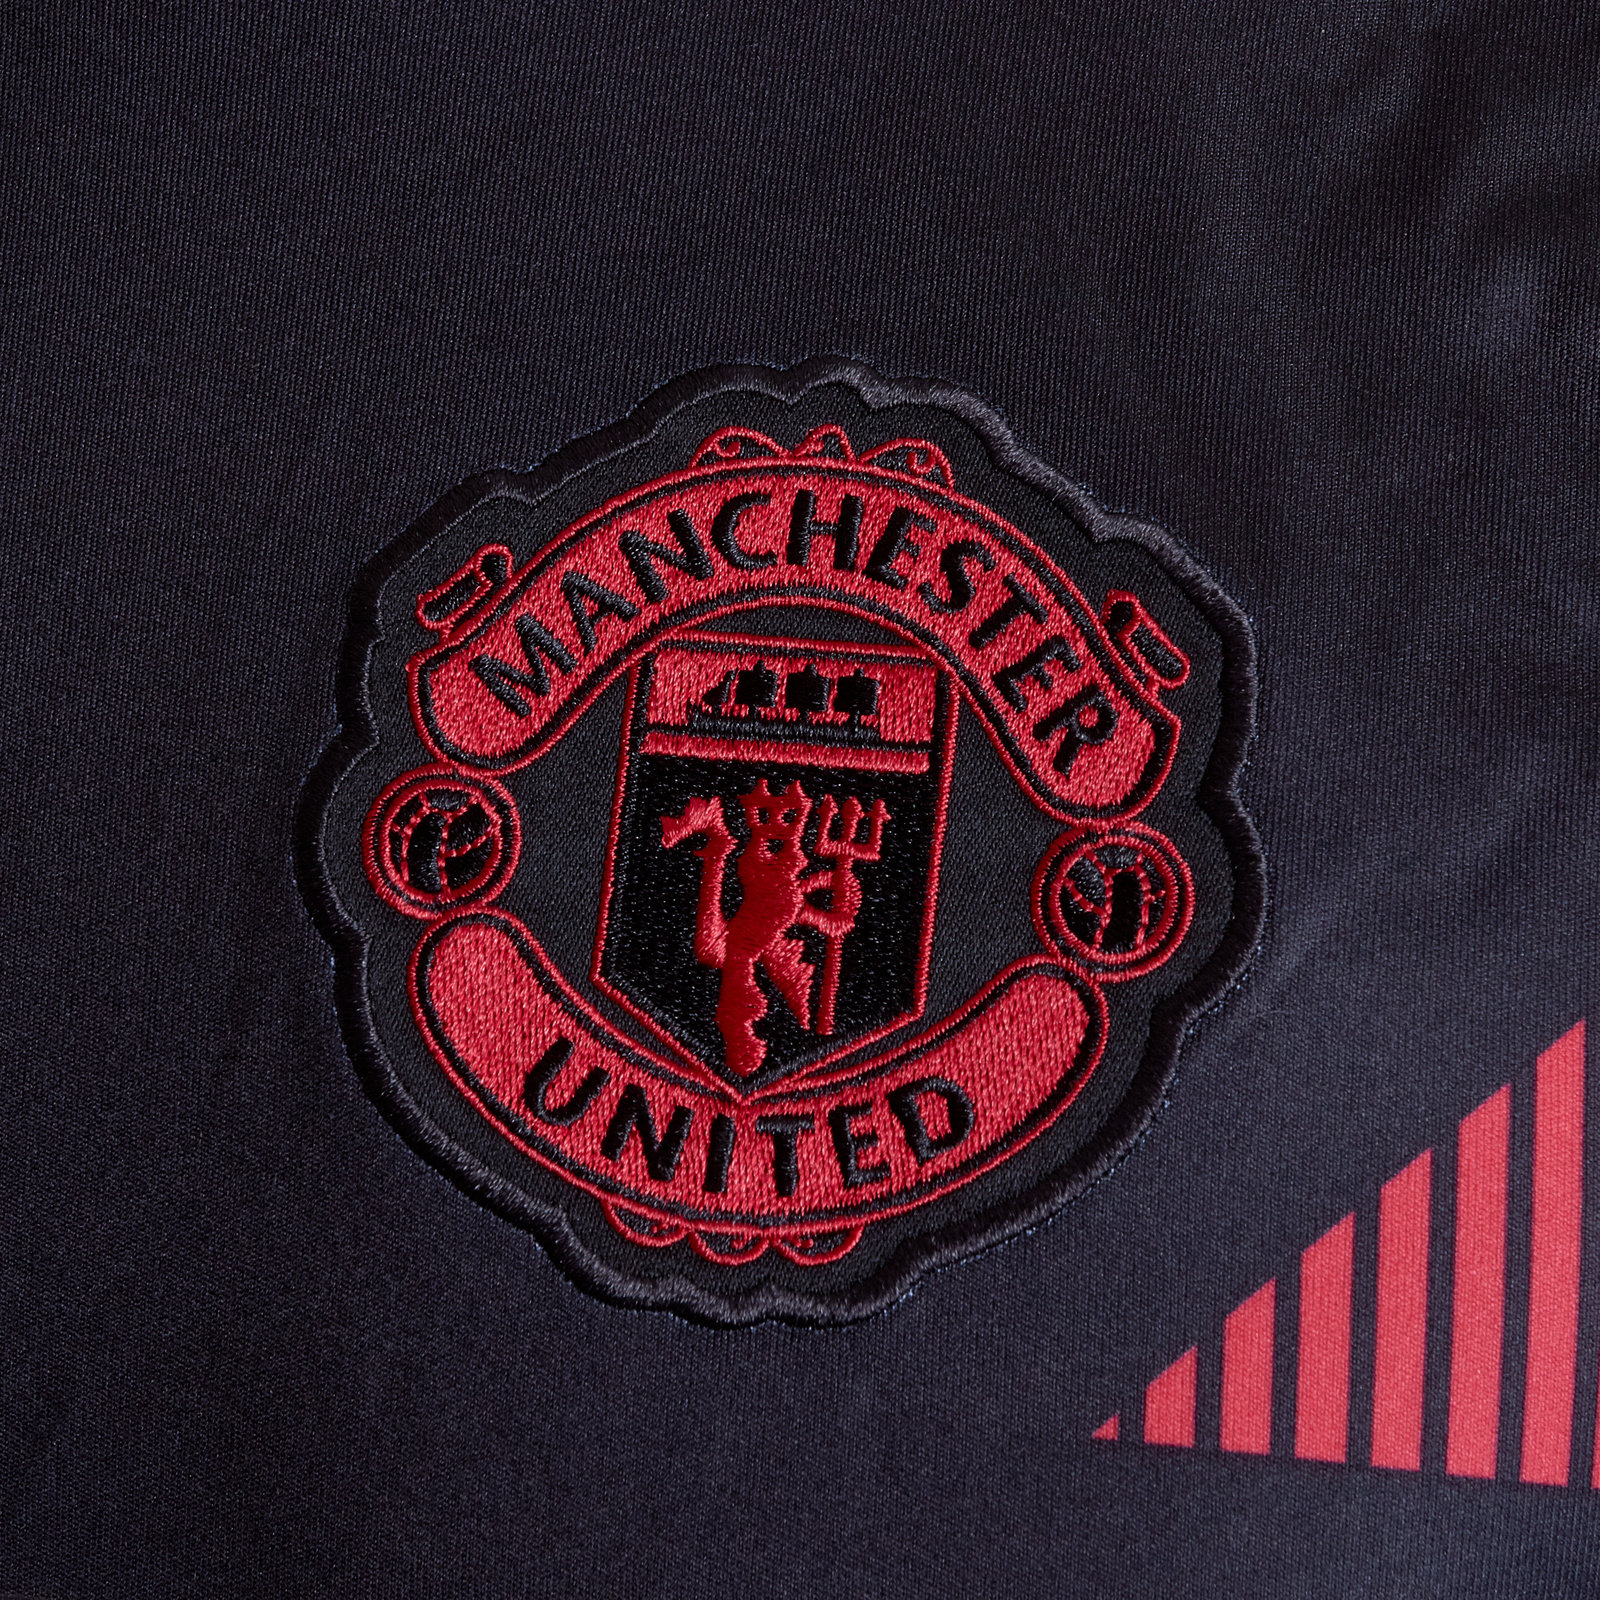 8f8dda6d825 adidas Mens Manchester United 18 19 Pre-Match Football Training Shirt Black